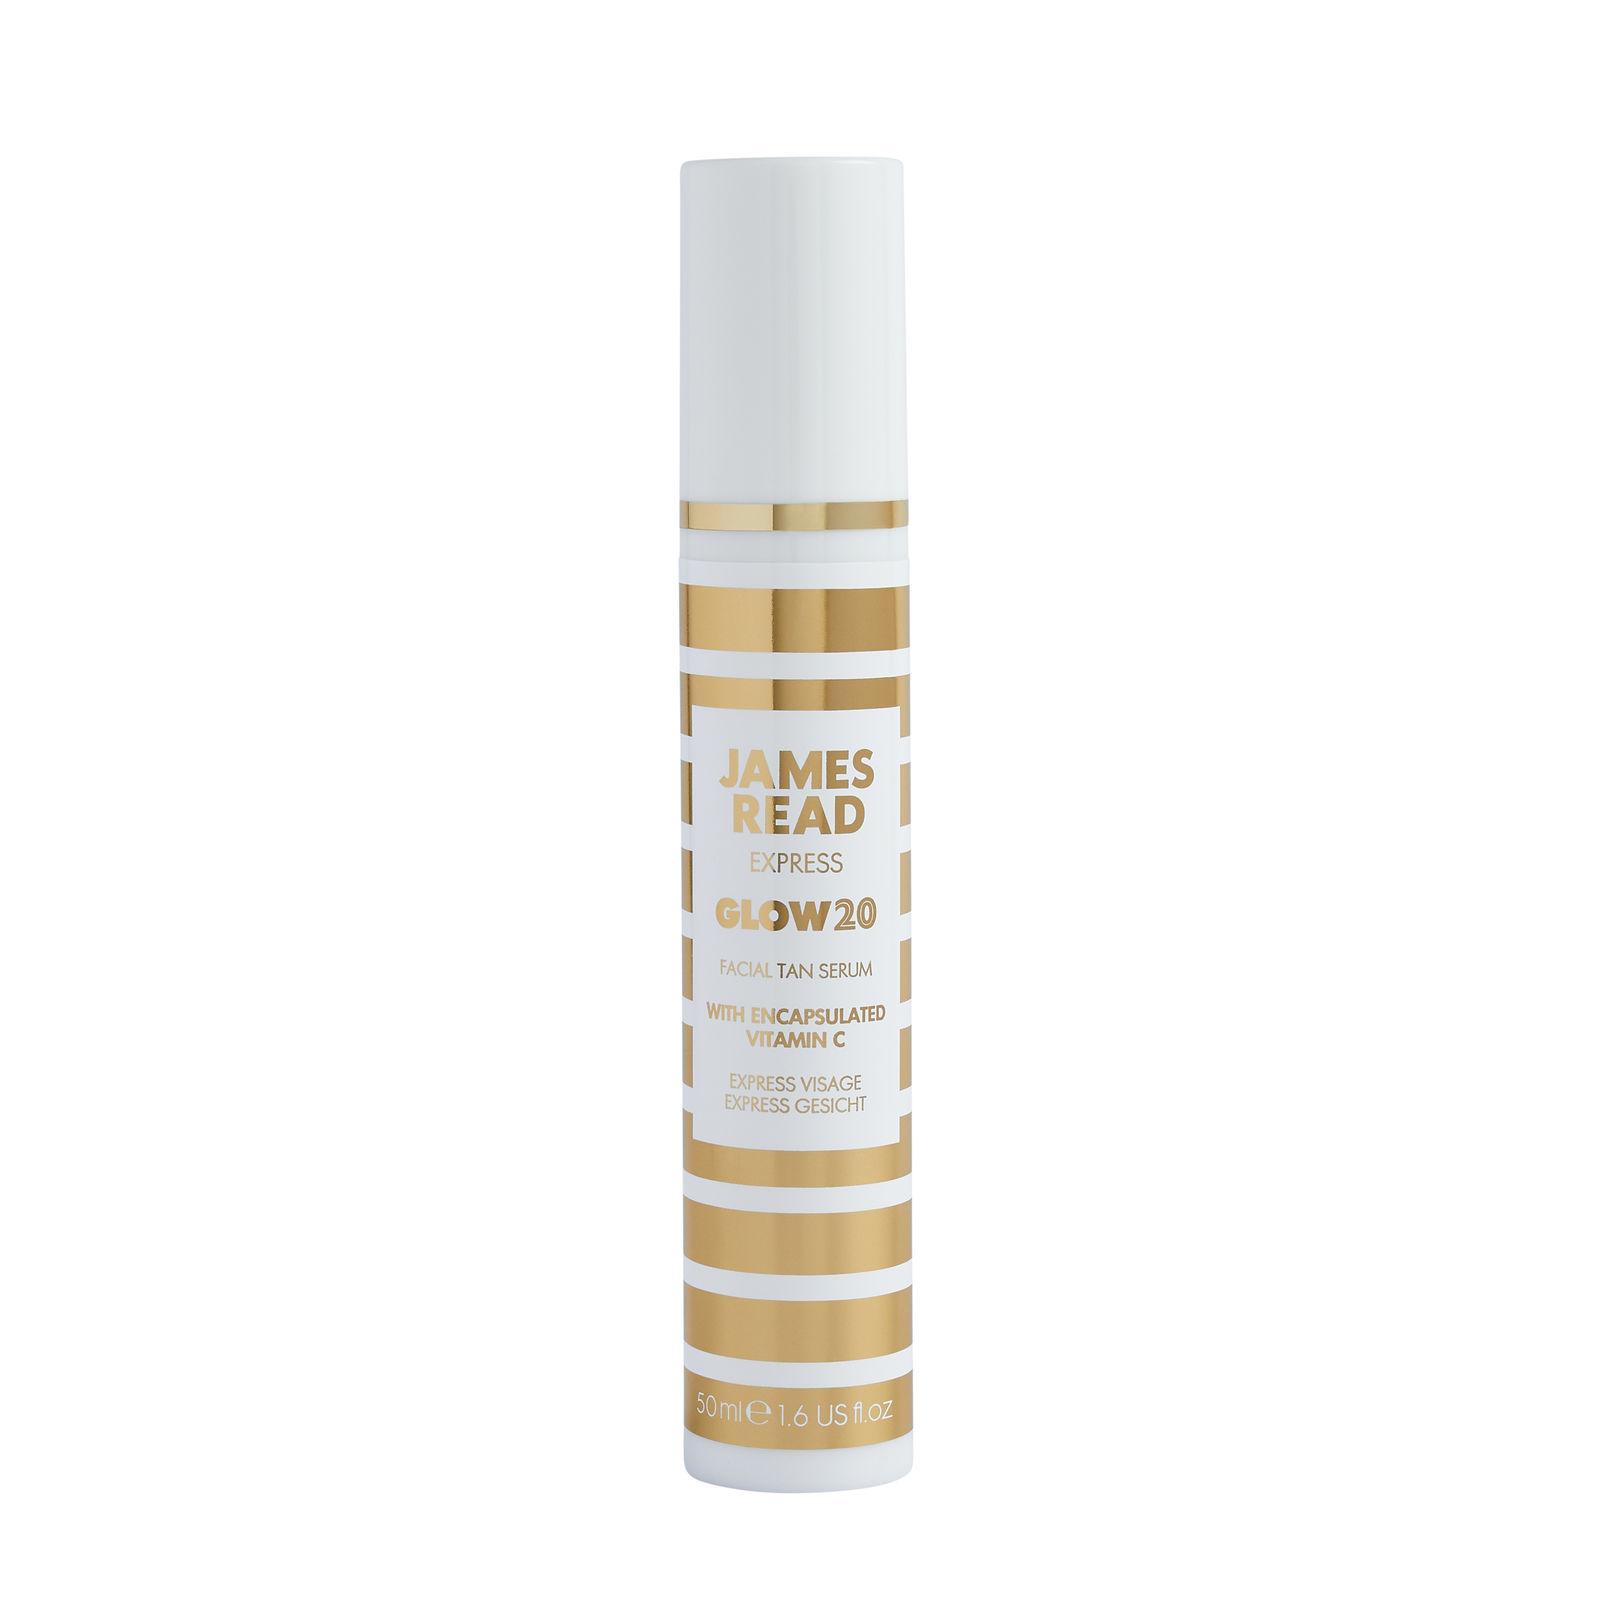 James Read - Glow 20 Facial Tan Serum 50 ml